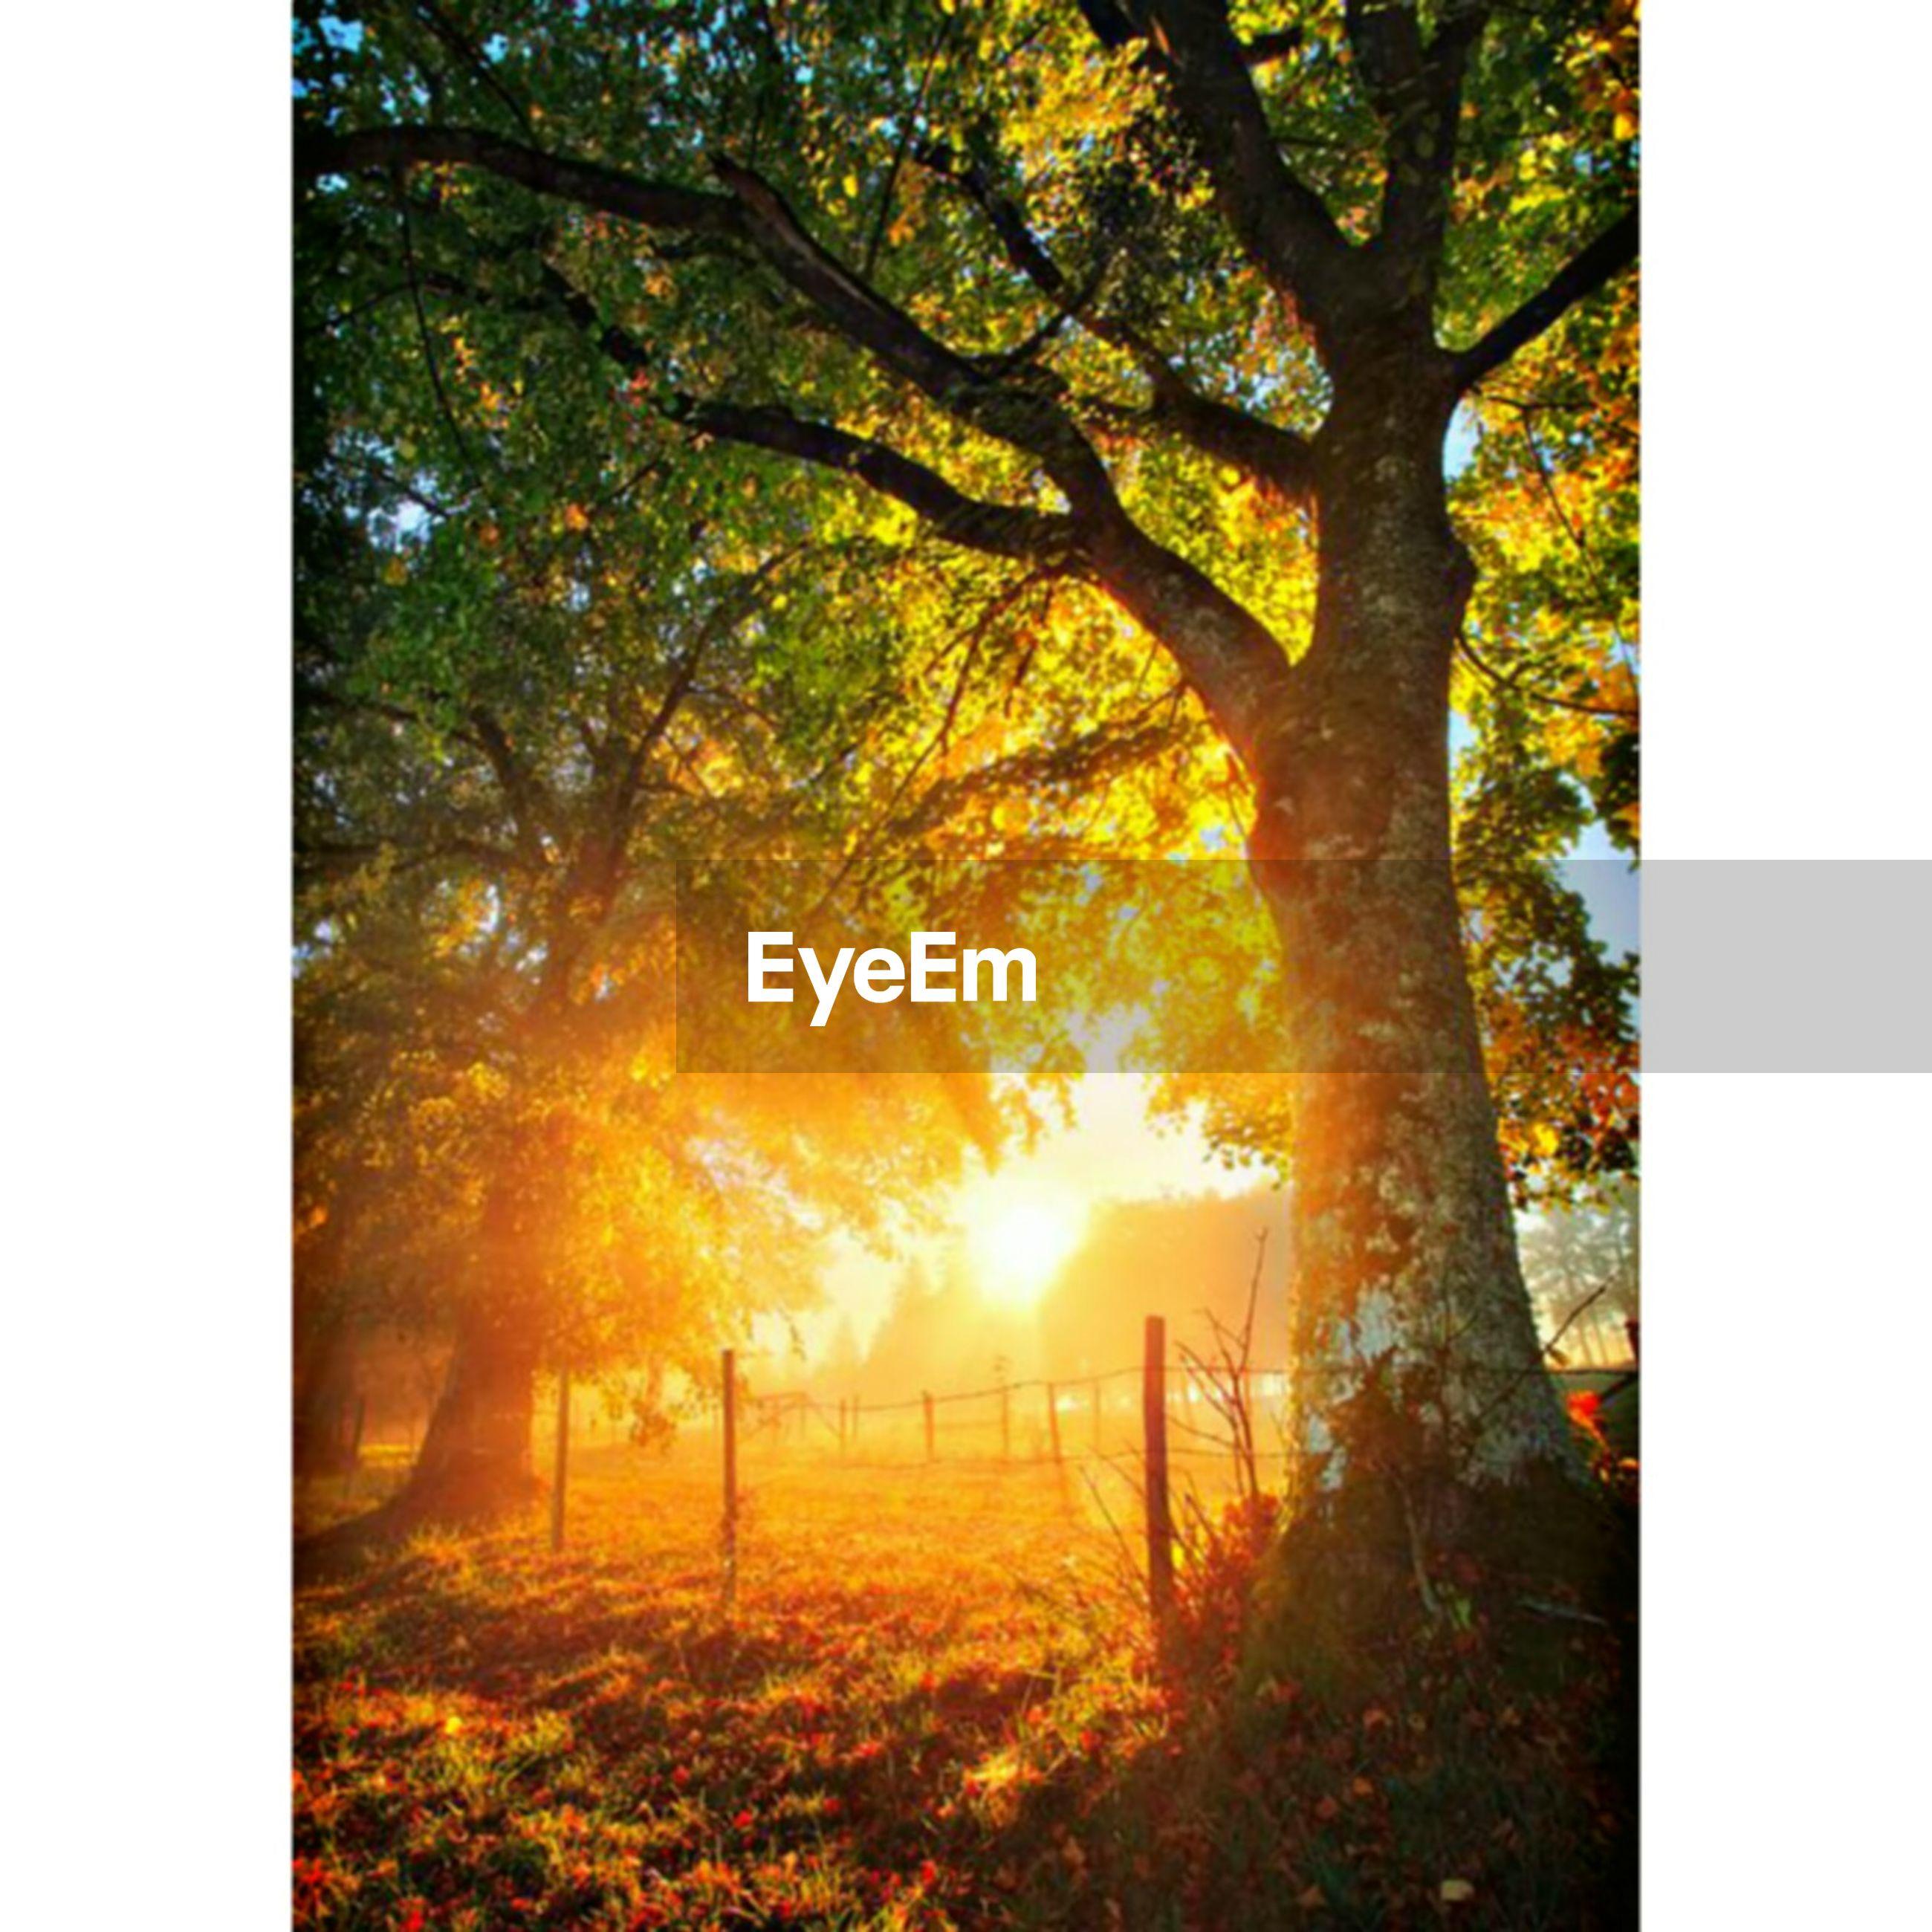 tree, nature, sunset, beauty in nature, sunlight, no people, idyllic, sun, grass, tranquility, outdoors, tranquil scene, scenics, autumn, growth, sunbeam, day, sky